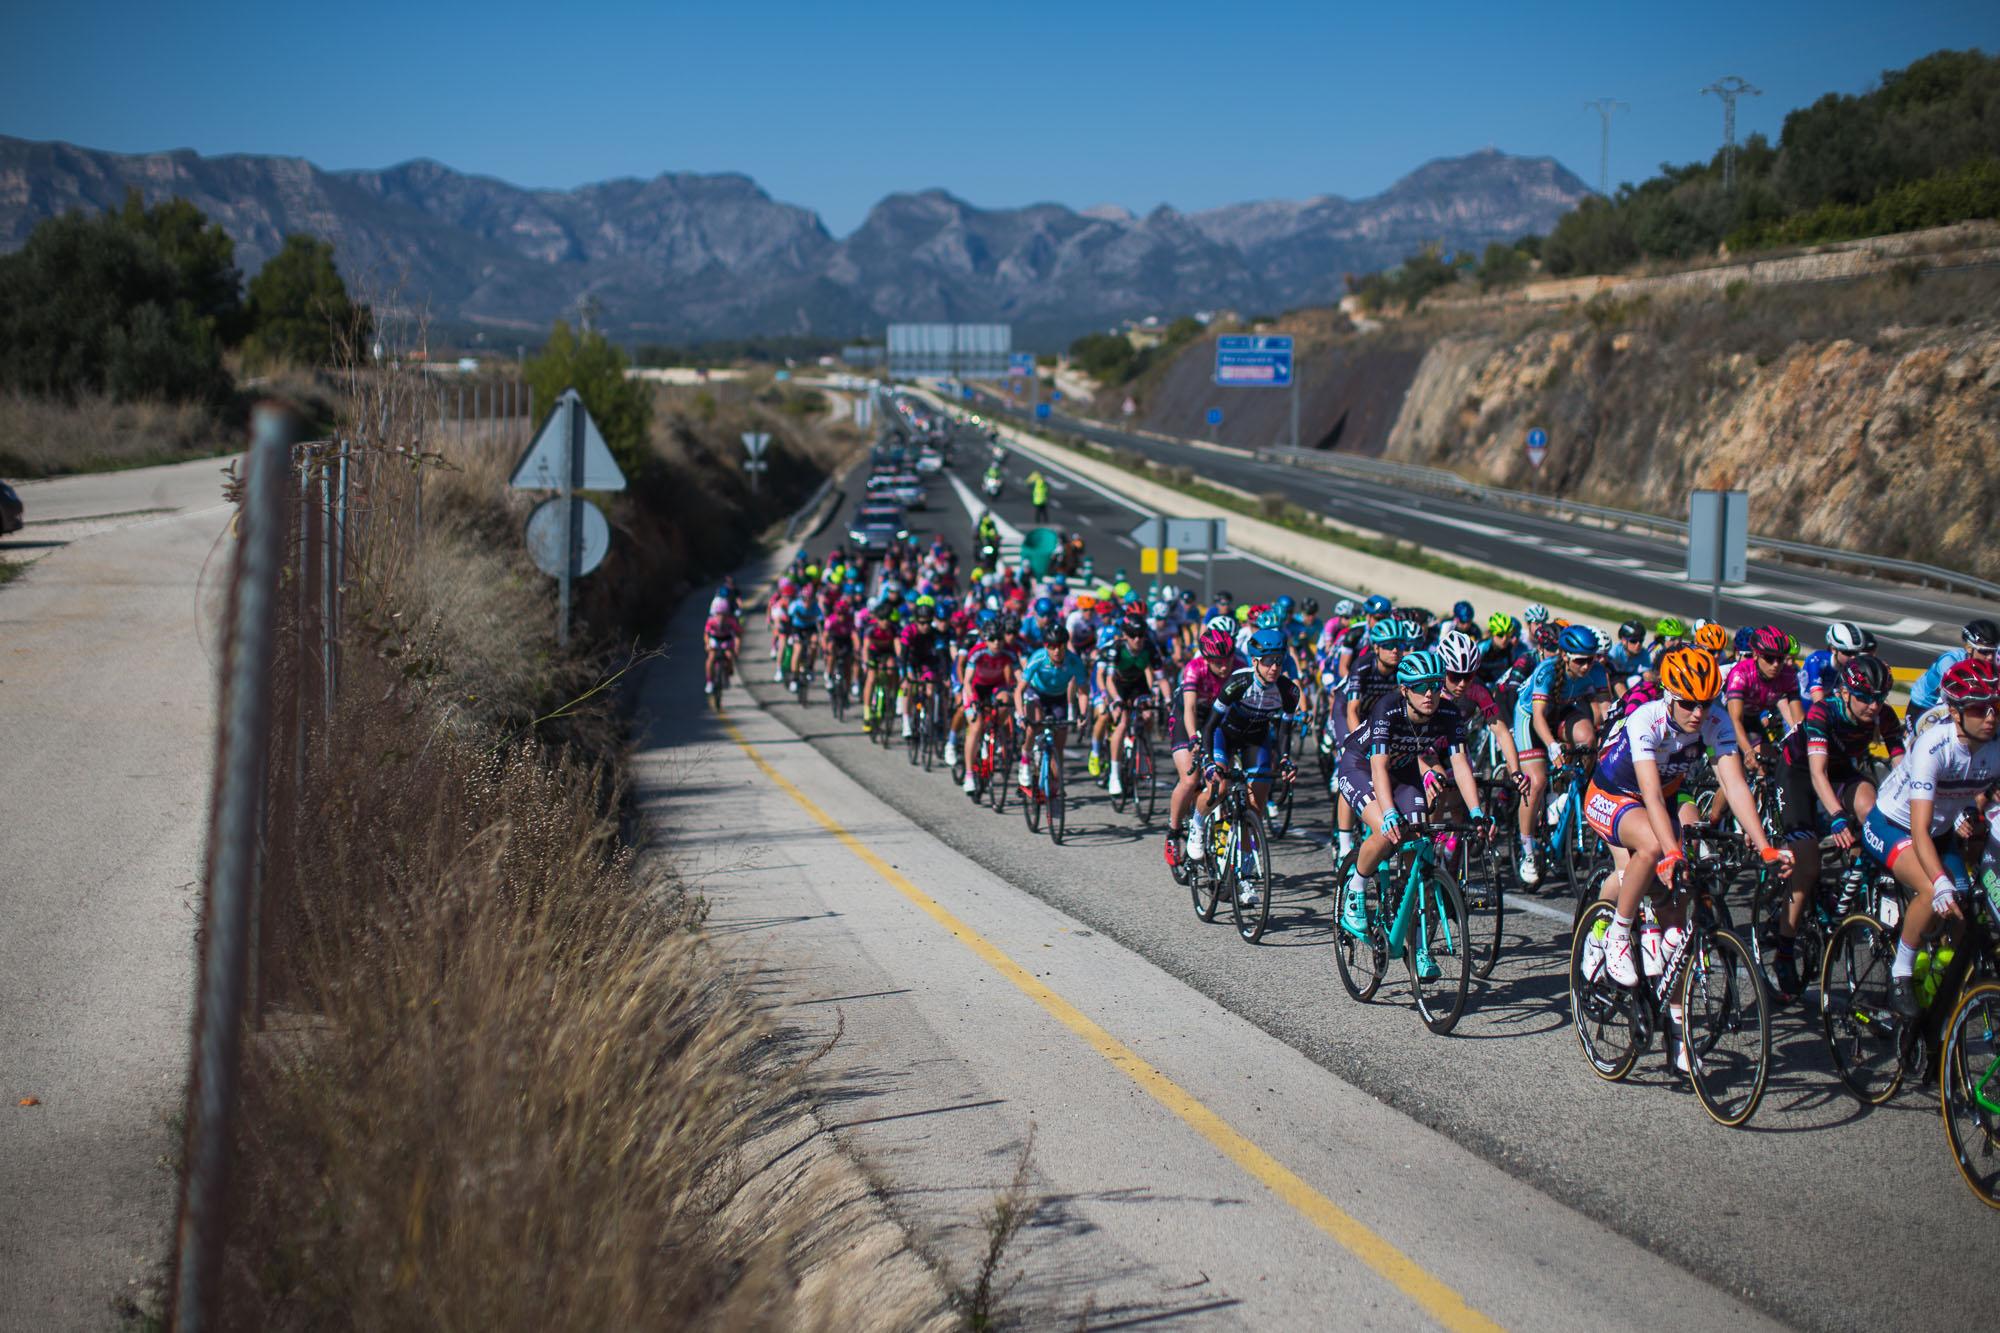 2018 Setmana Ciclista Valenciana - Stage 1